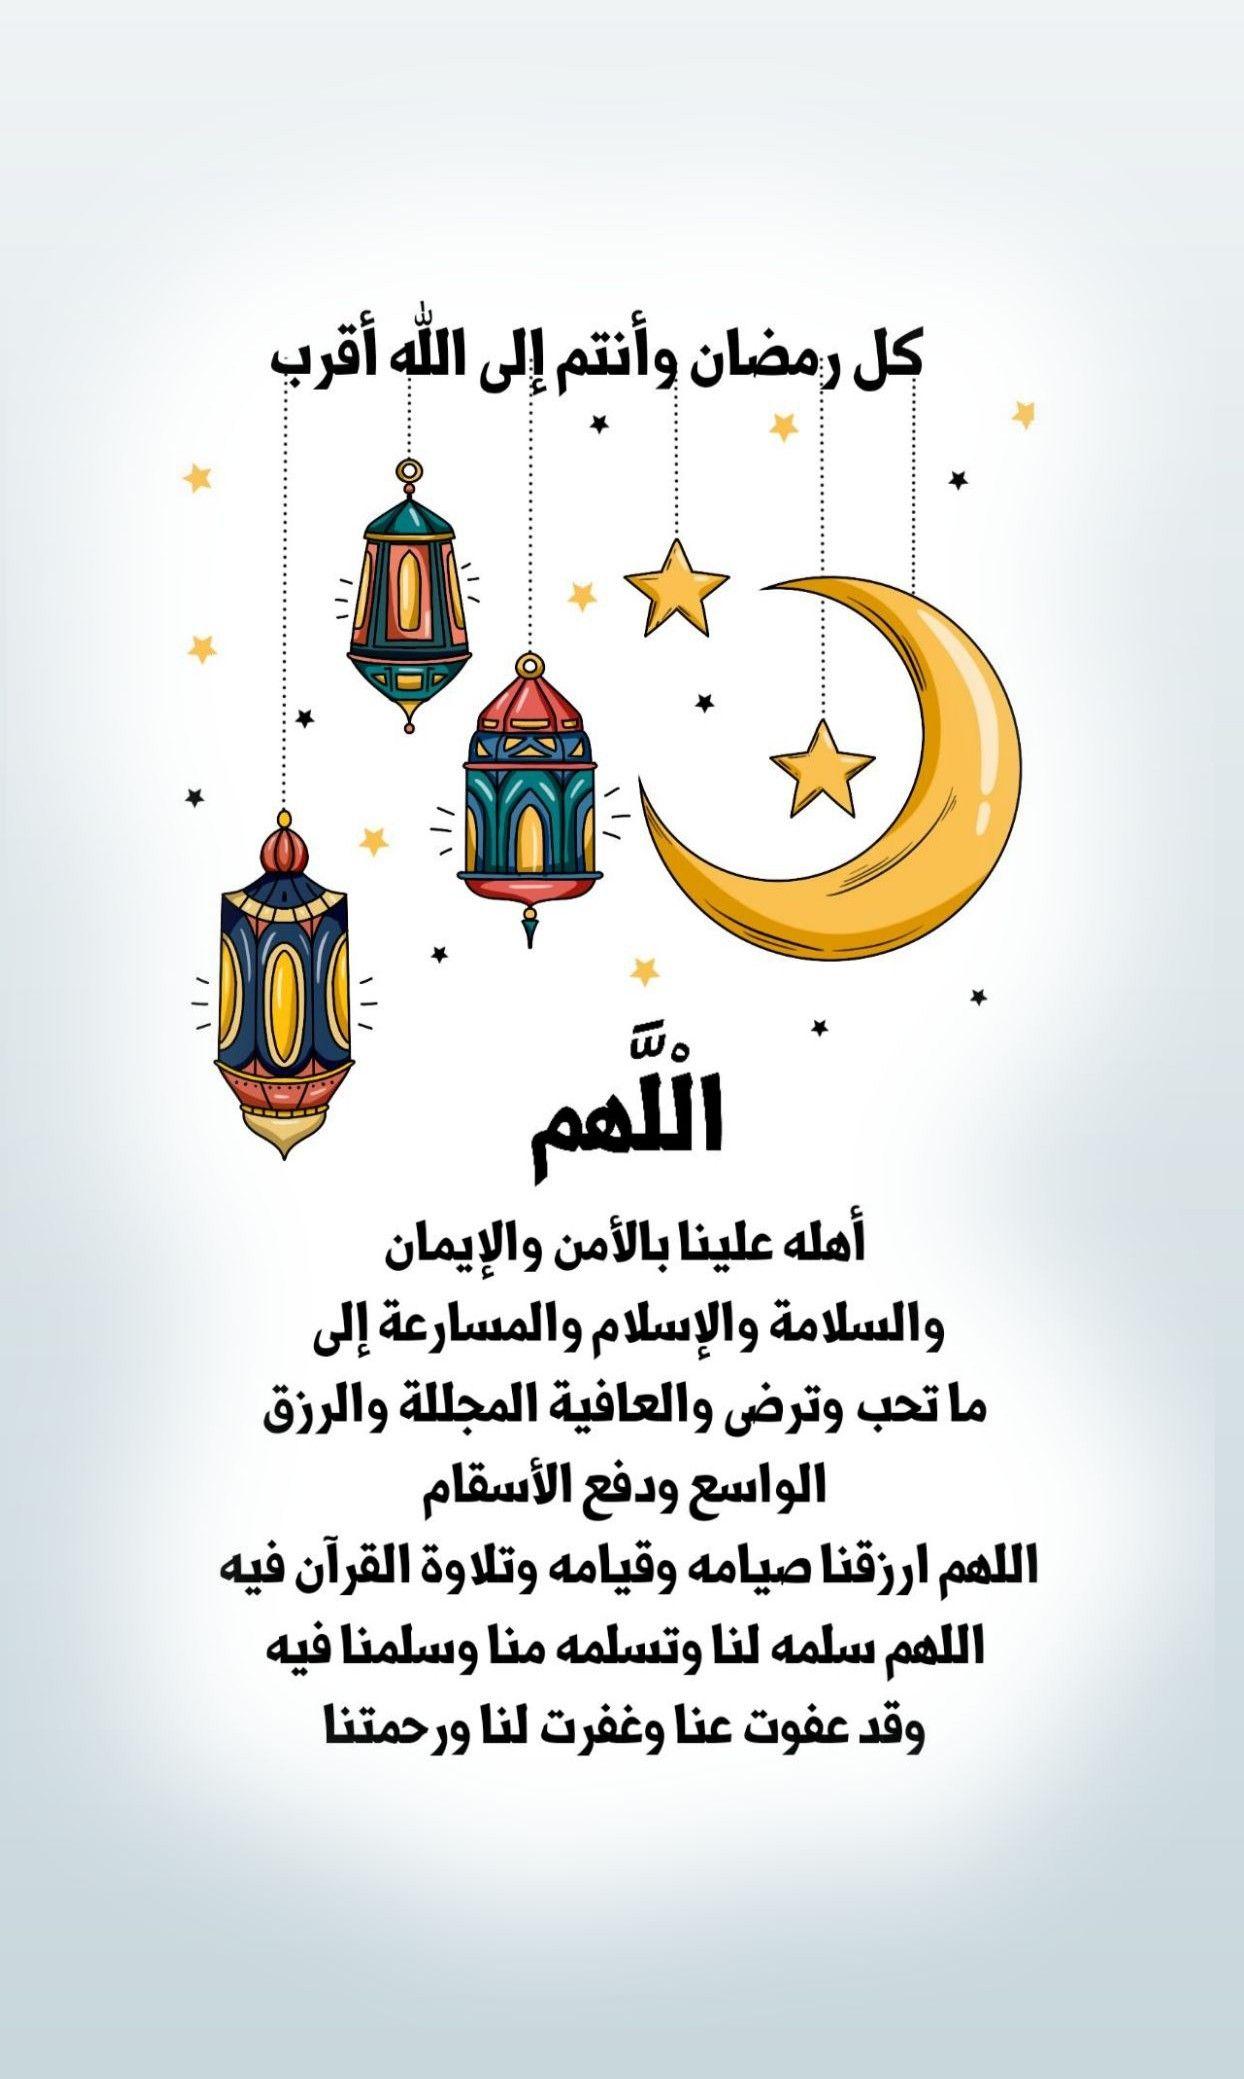 Pin By Taataaa On دعاء و حكمه Ramadan Images Ramadan Day Ramadan Kareem